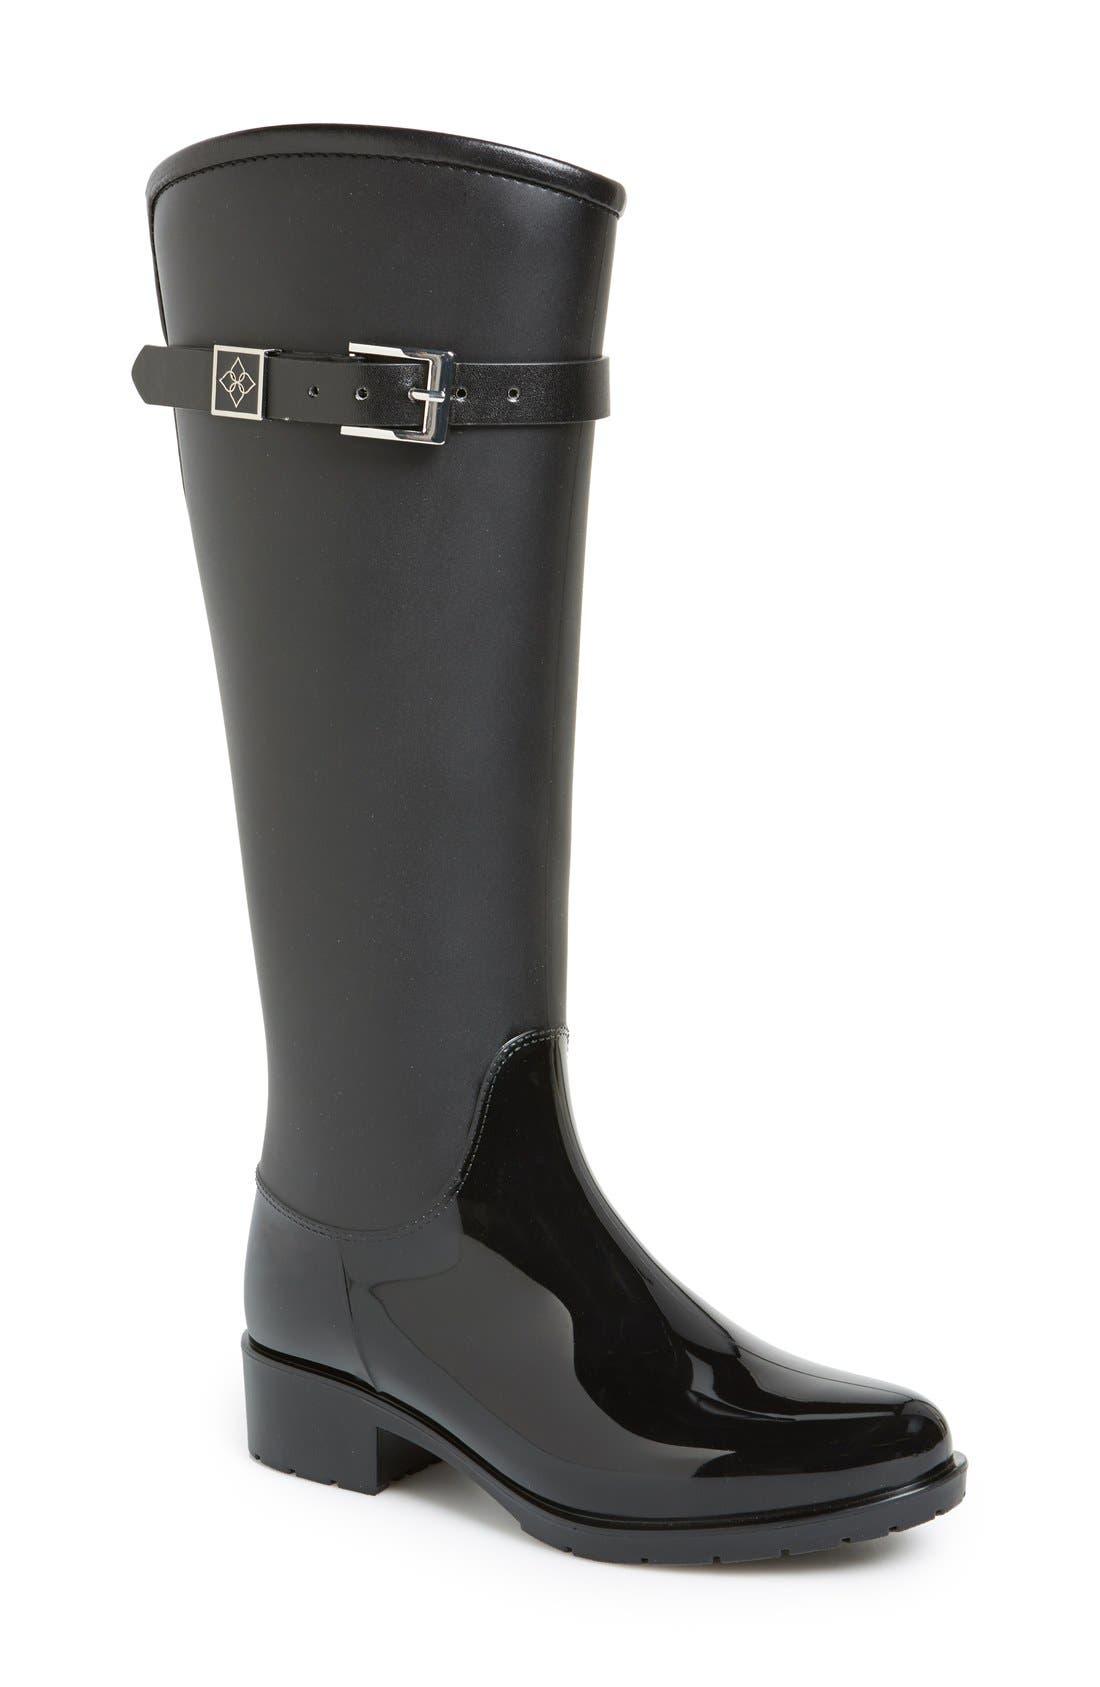 Main Image - däv 'Lisbon' Weatherproof Knee High Rain Boot (Women)